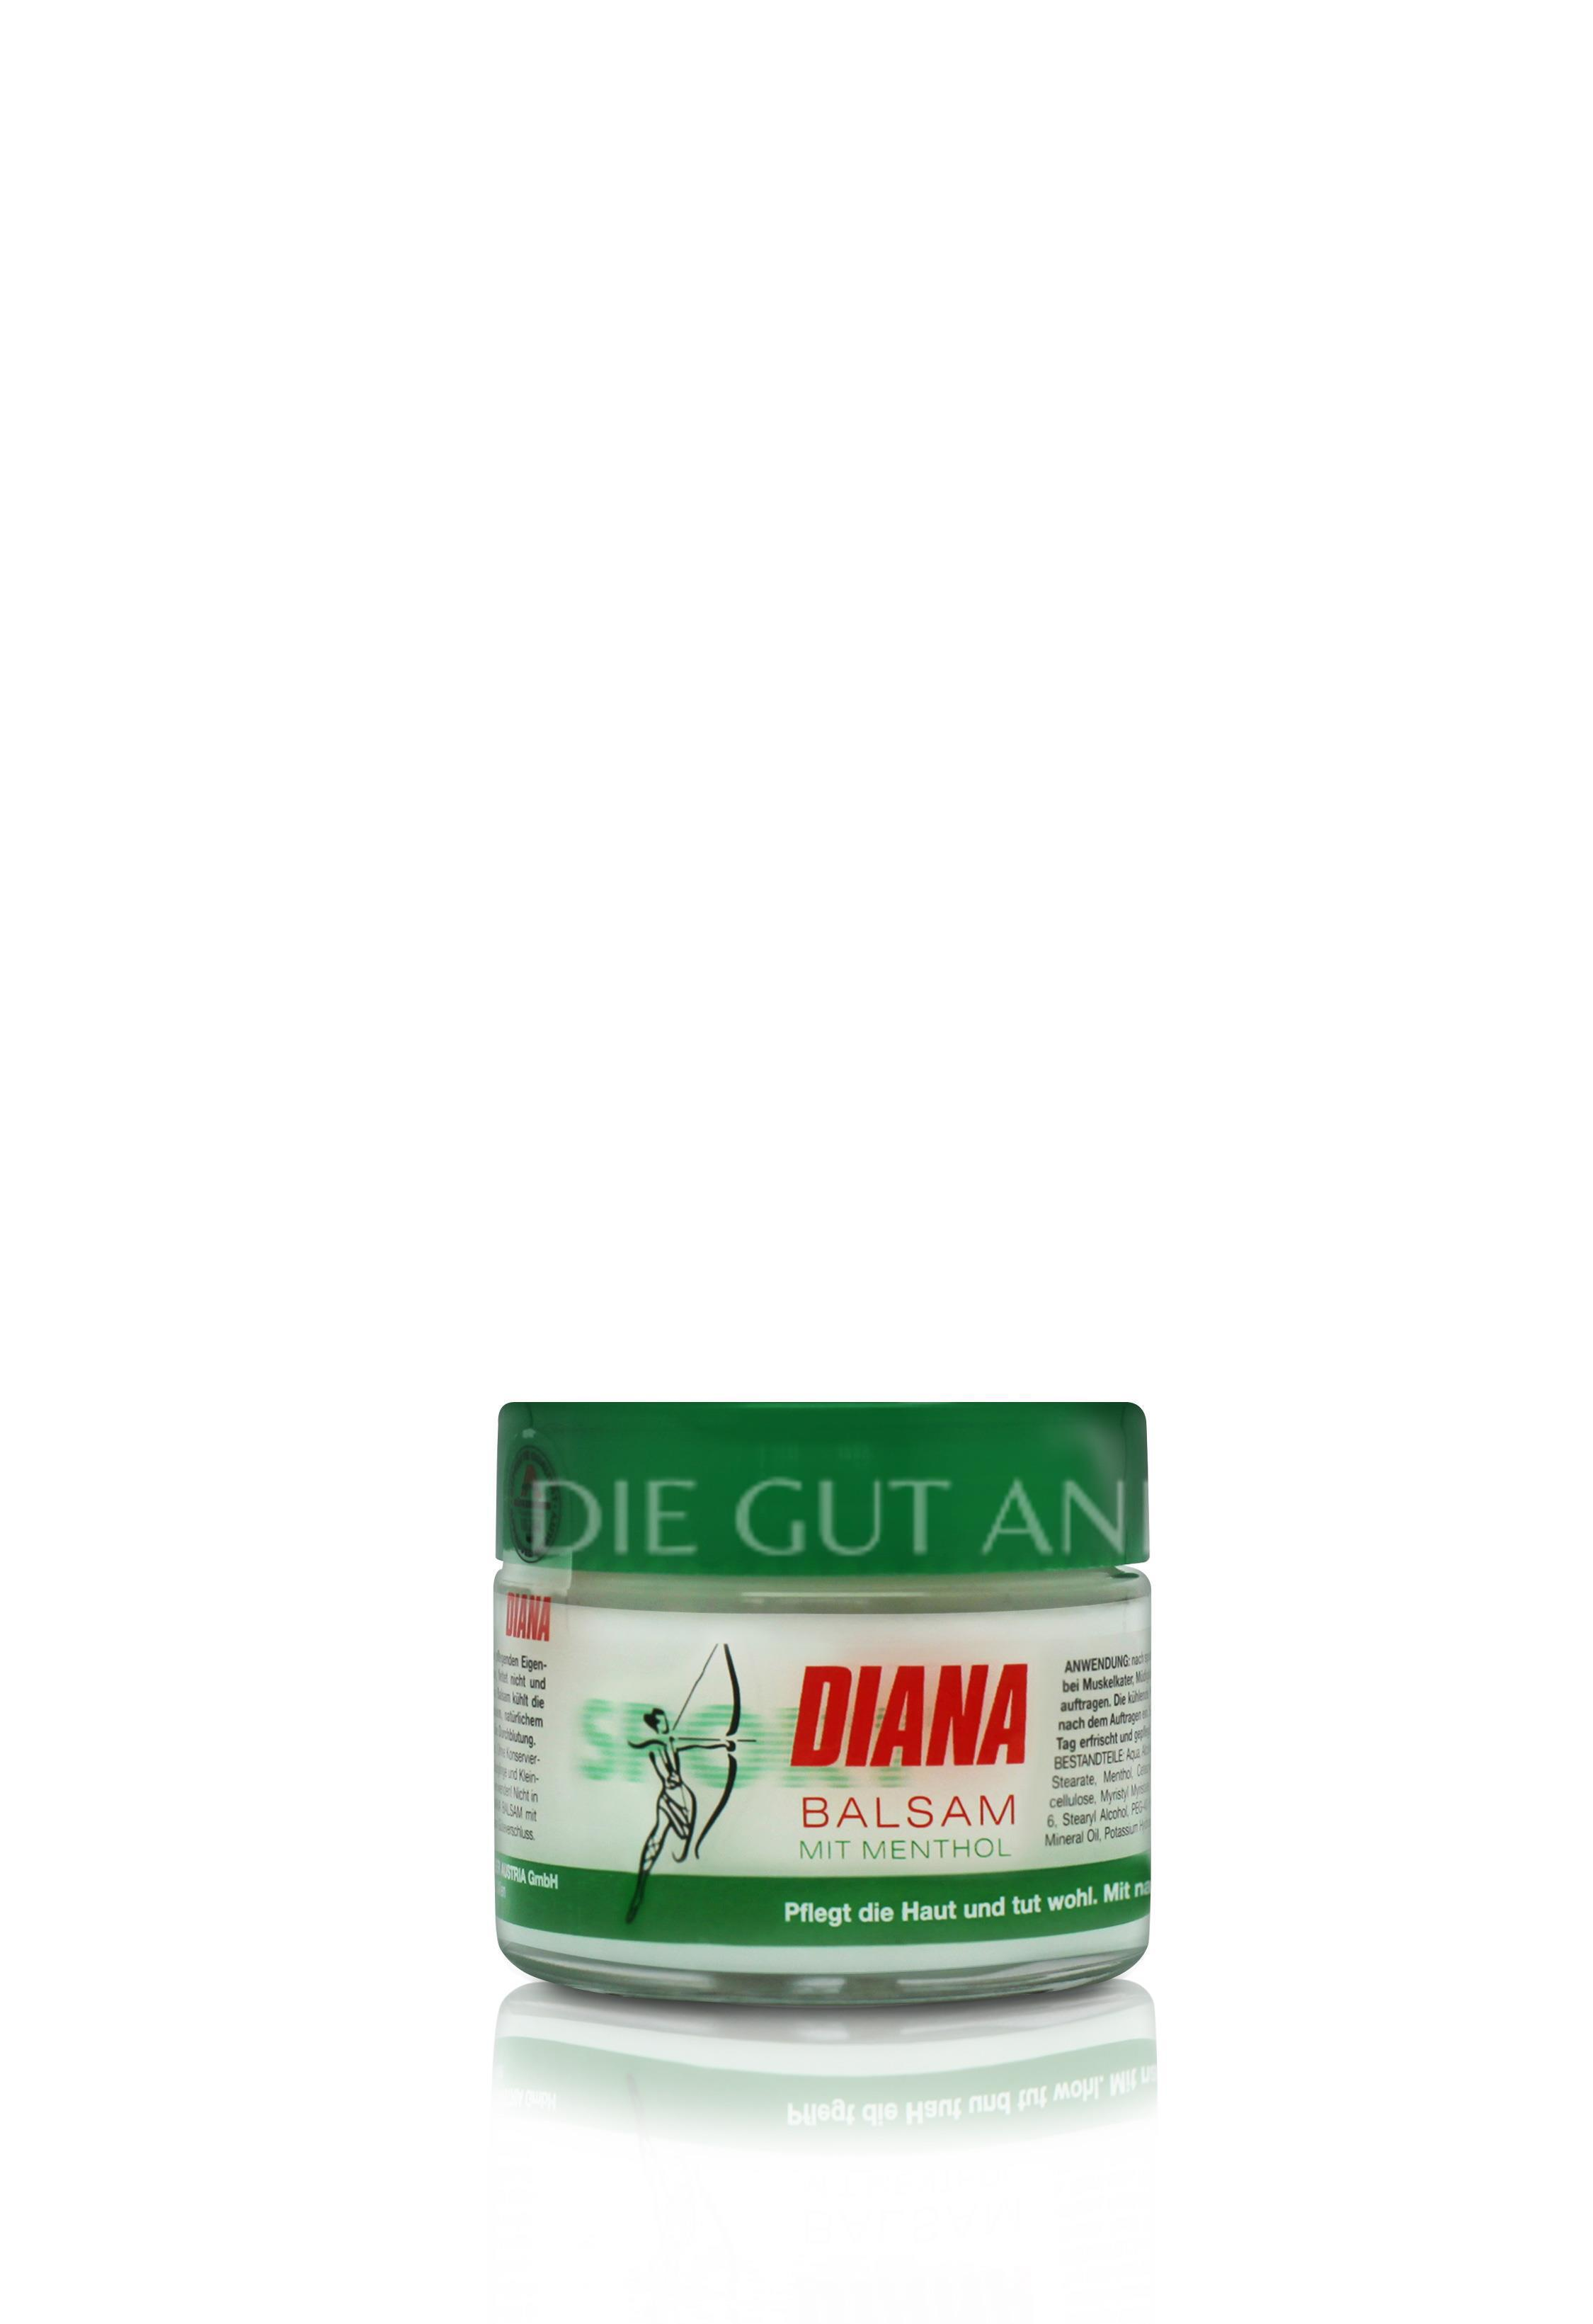 Diana® Balsam mit Menthol